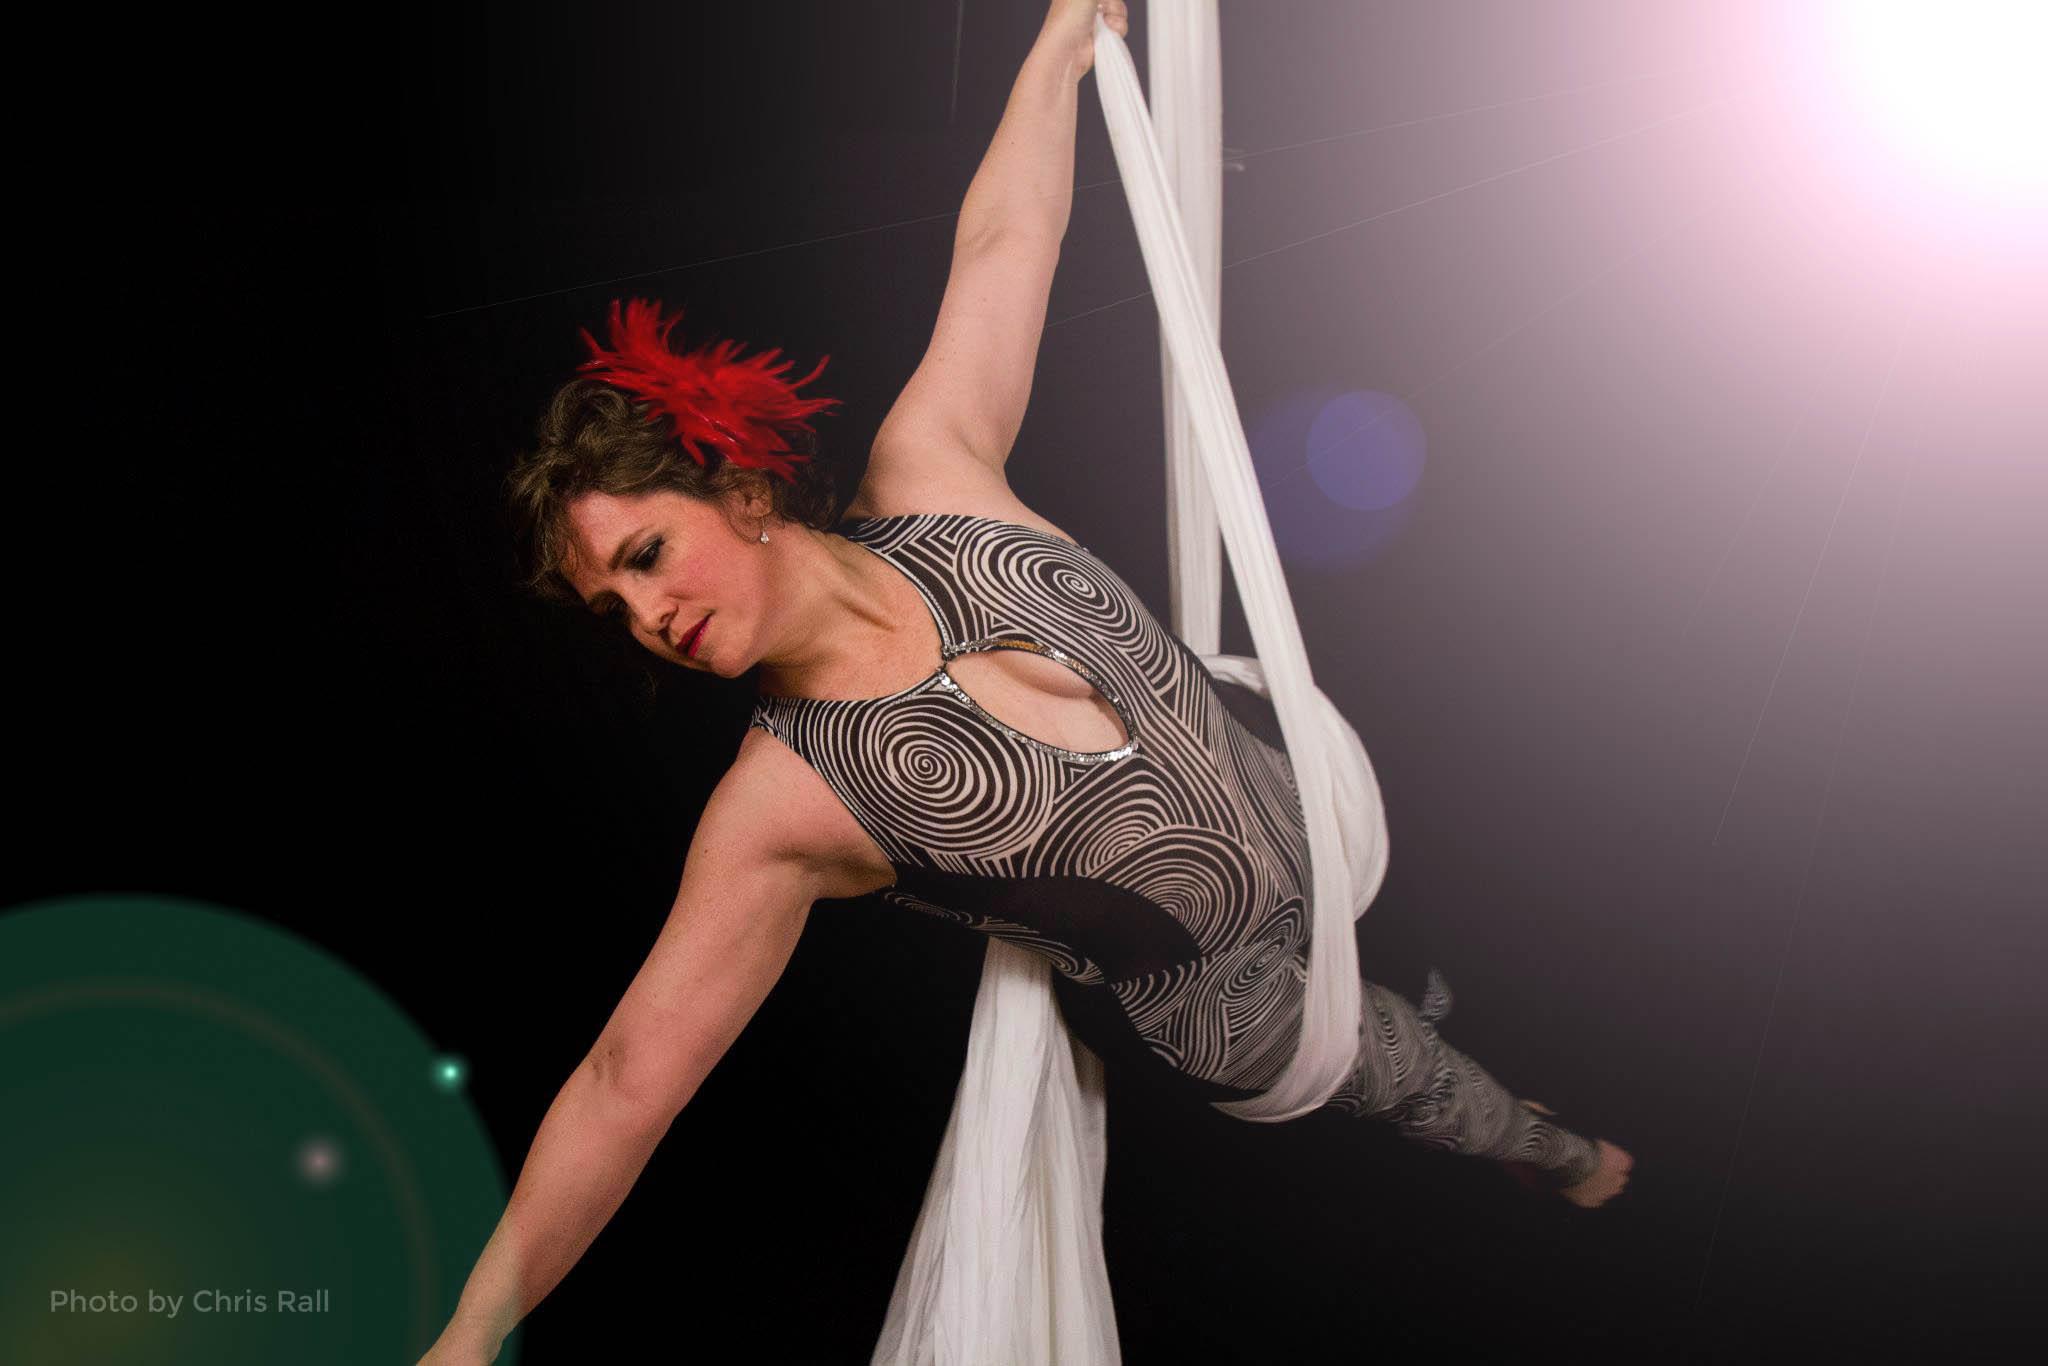 Juliana Burrell Owner/Master Instructor